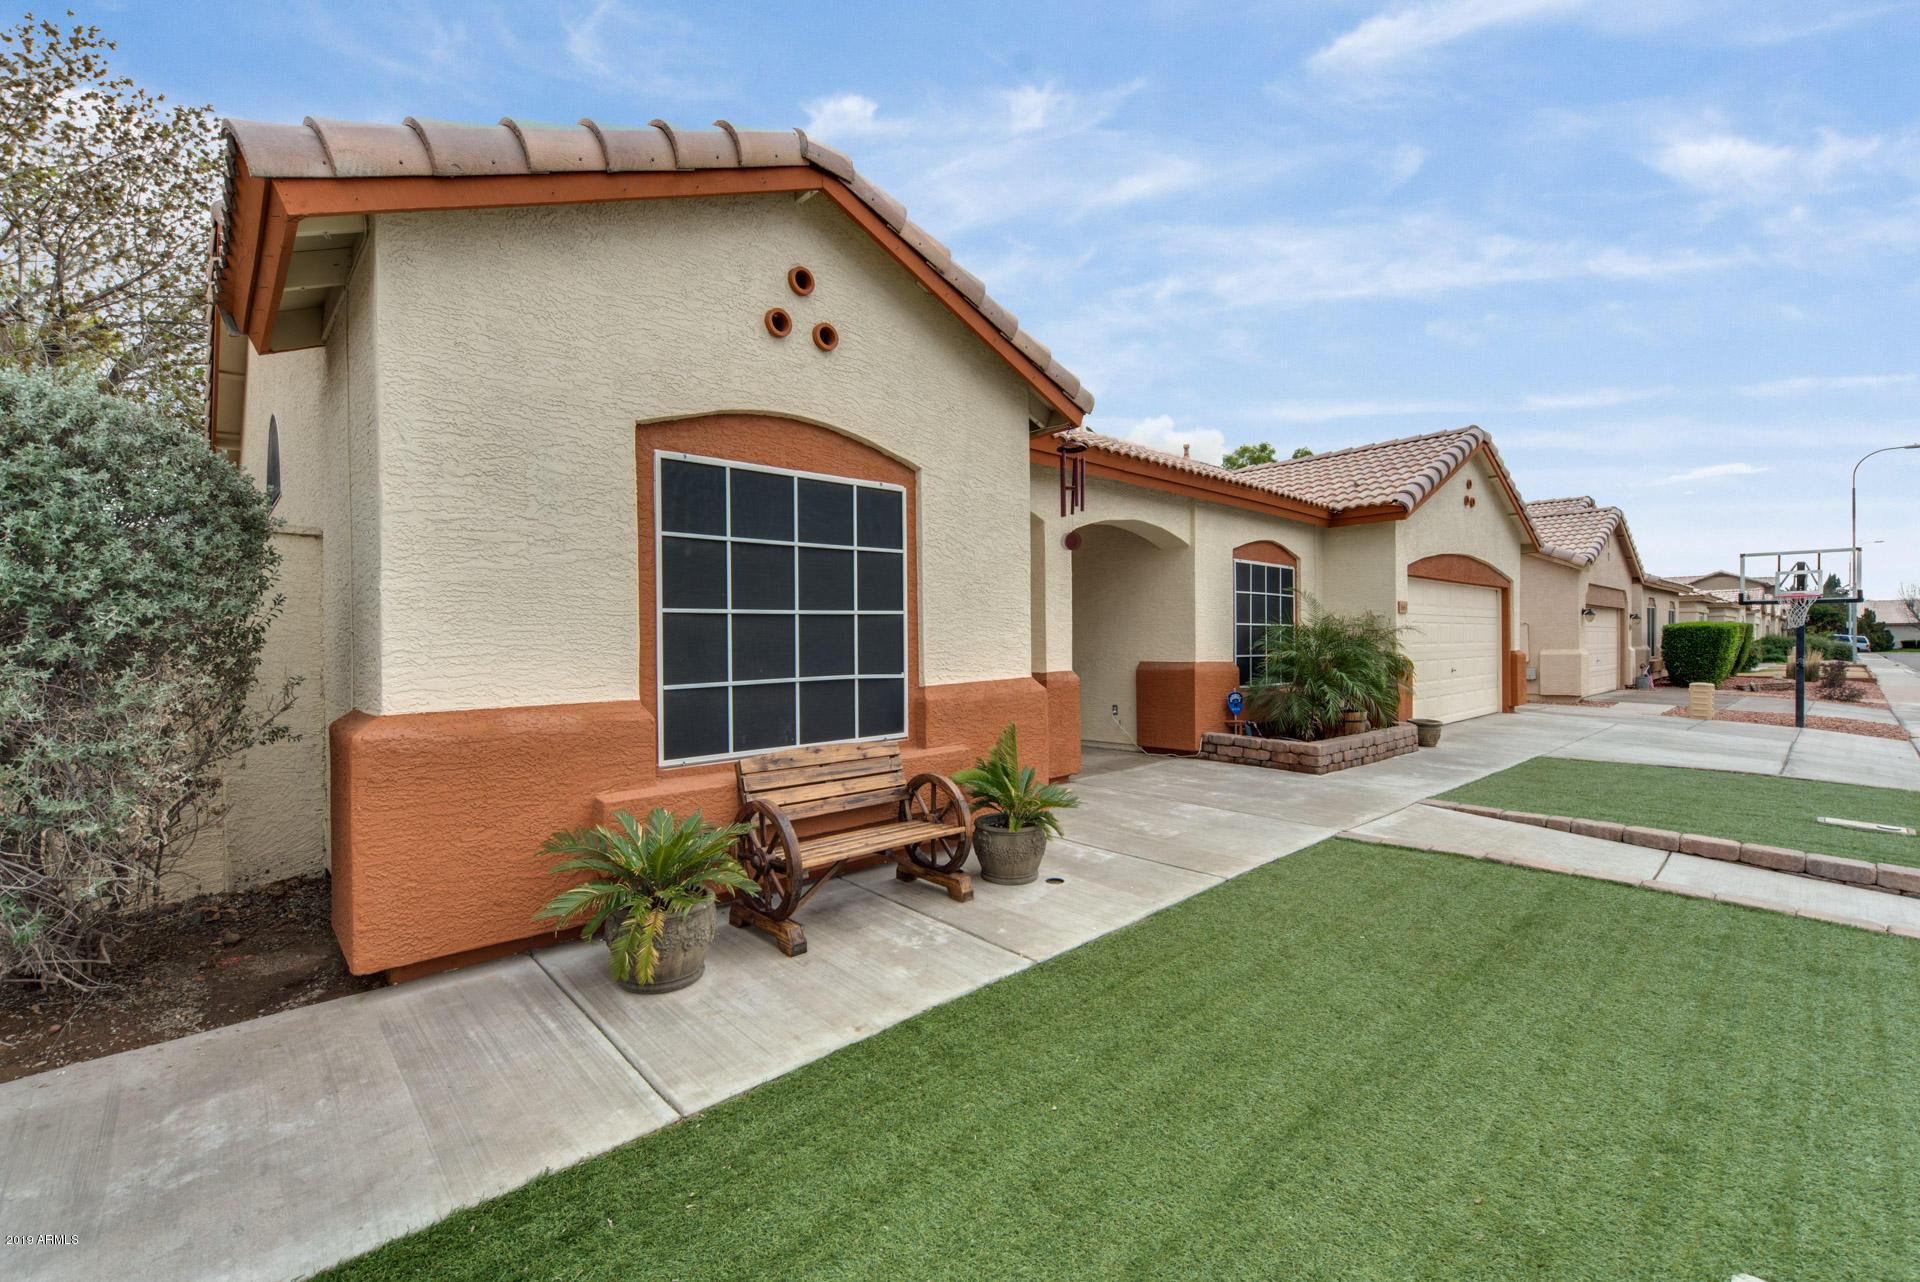 Photo of 1663 E CONSTITUTION Drive, Chandler, AZ 85225